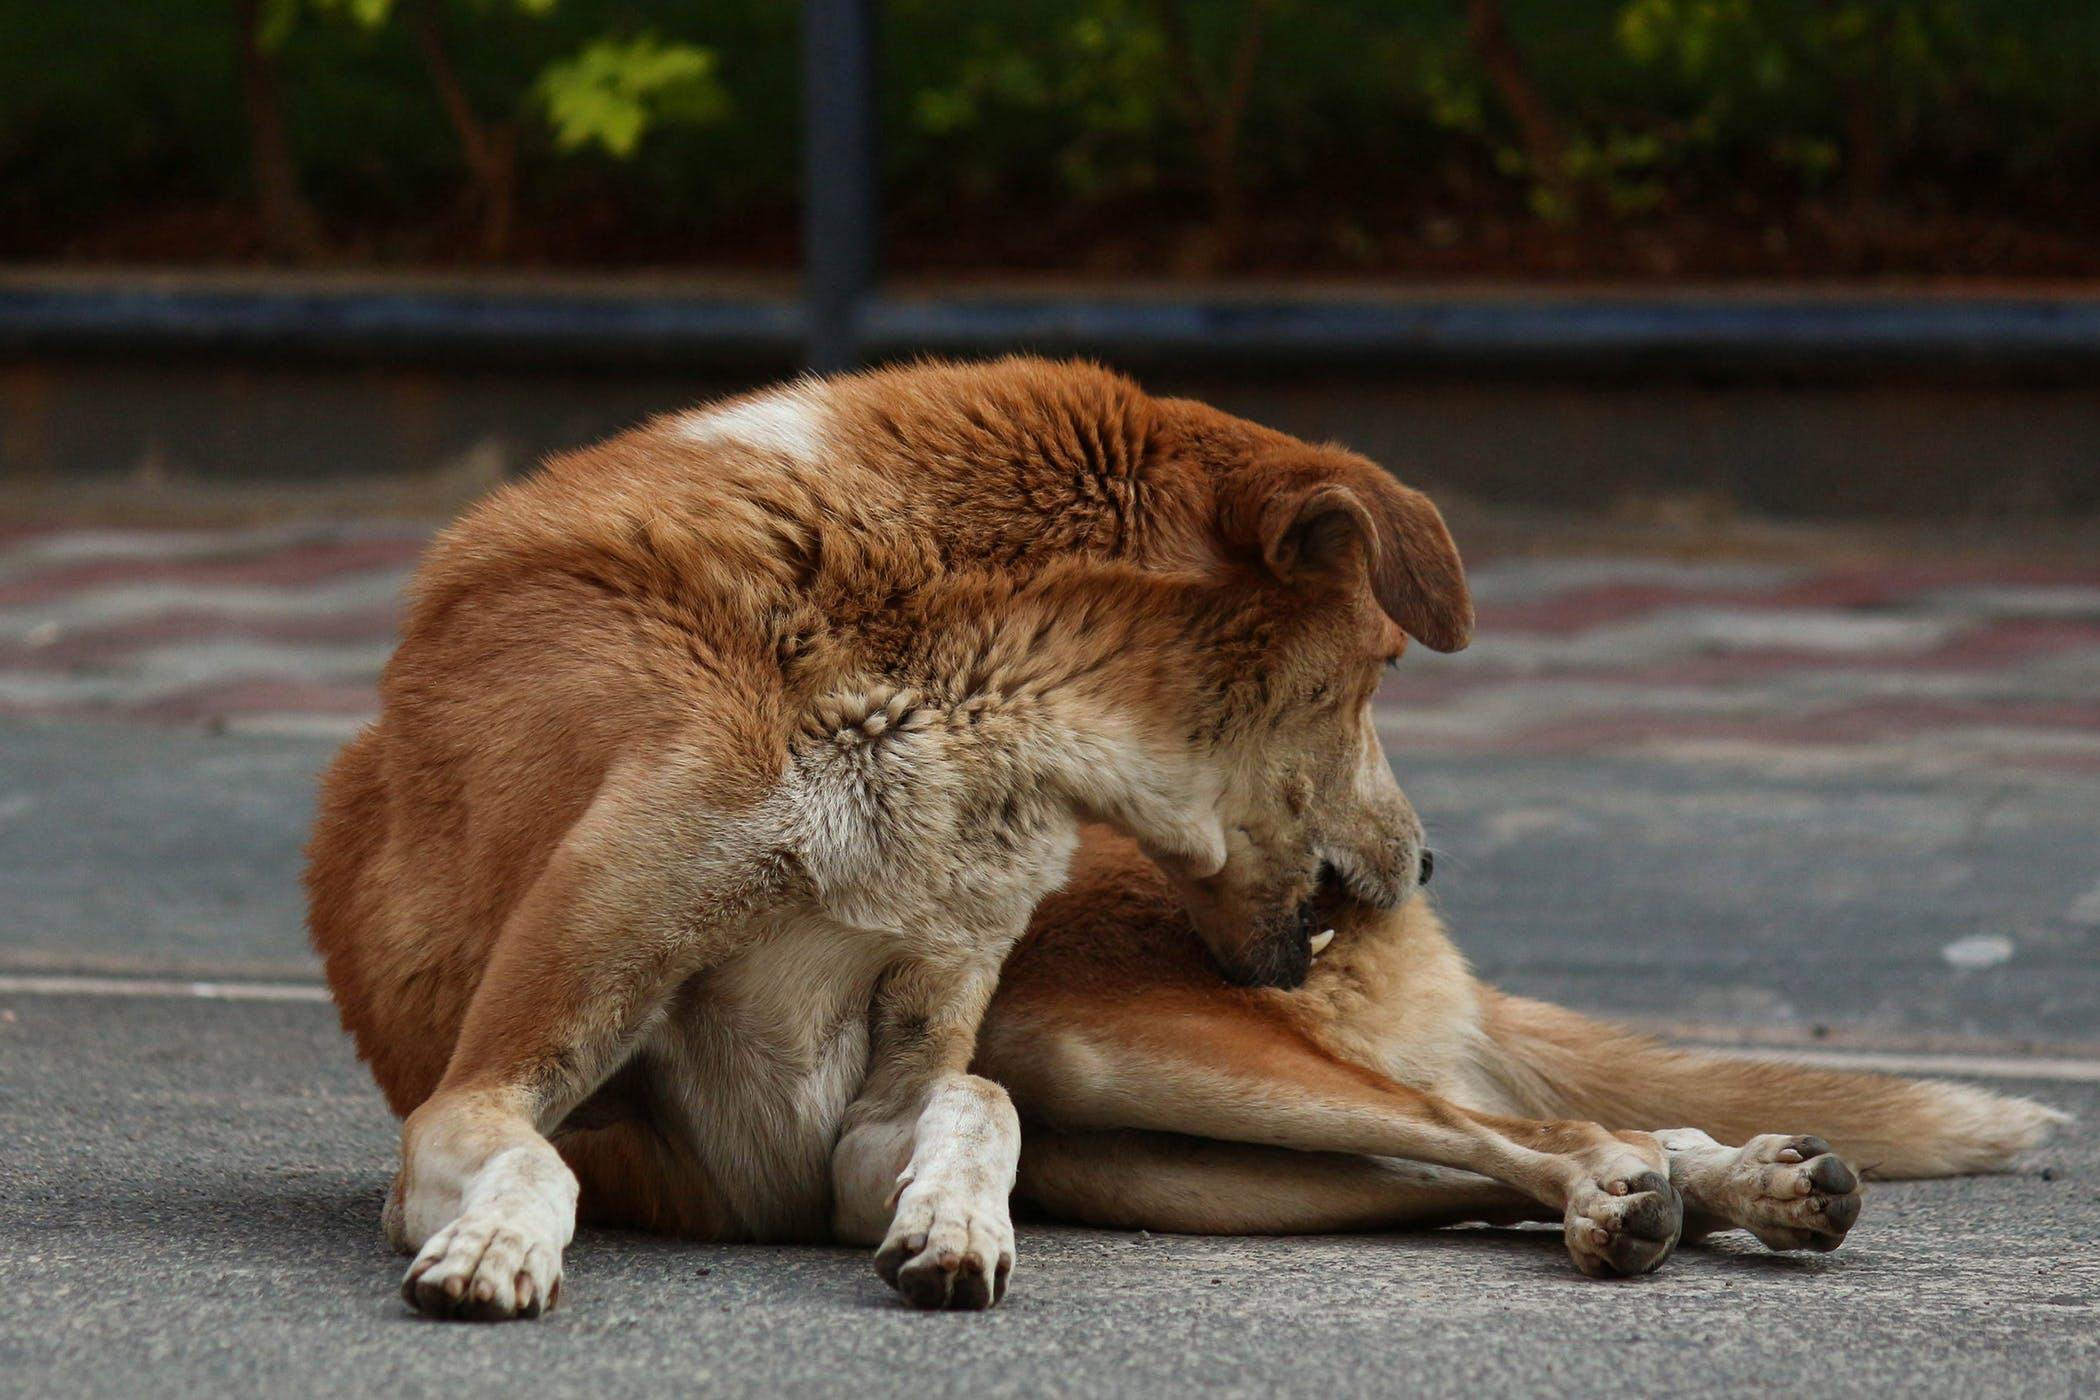 Epidermal Dysplasia in Dogs